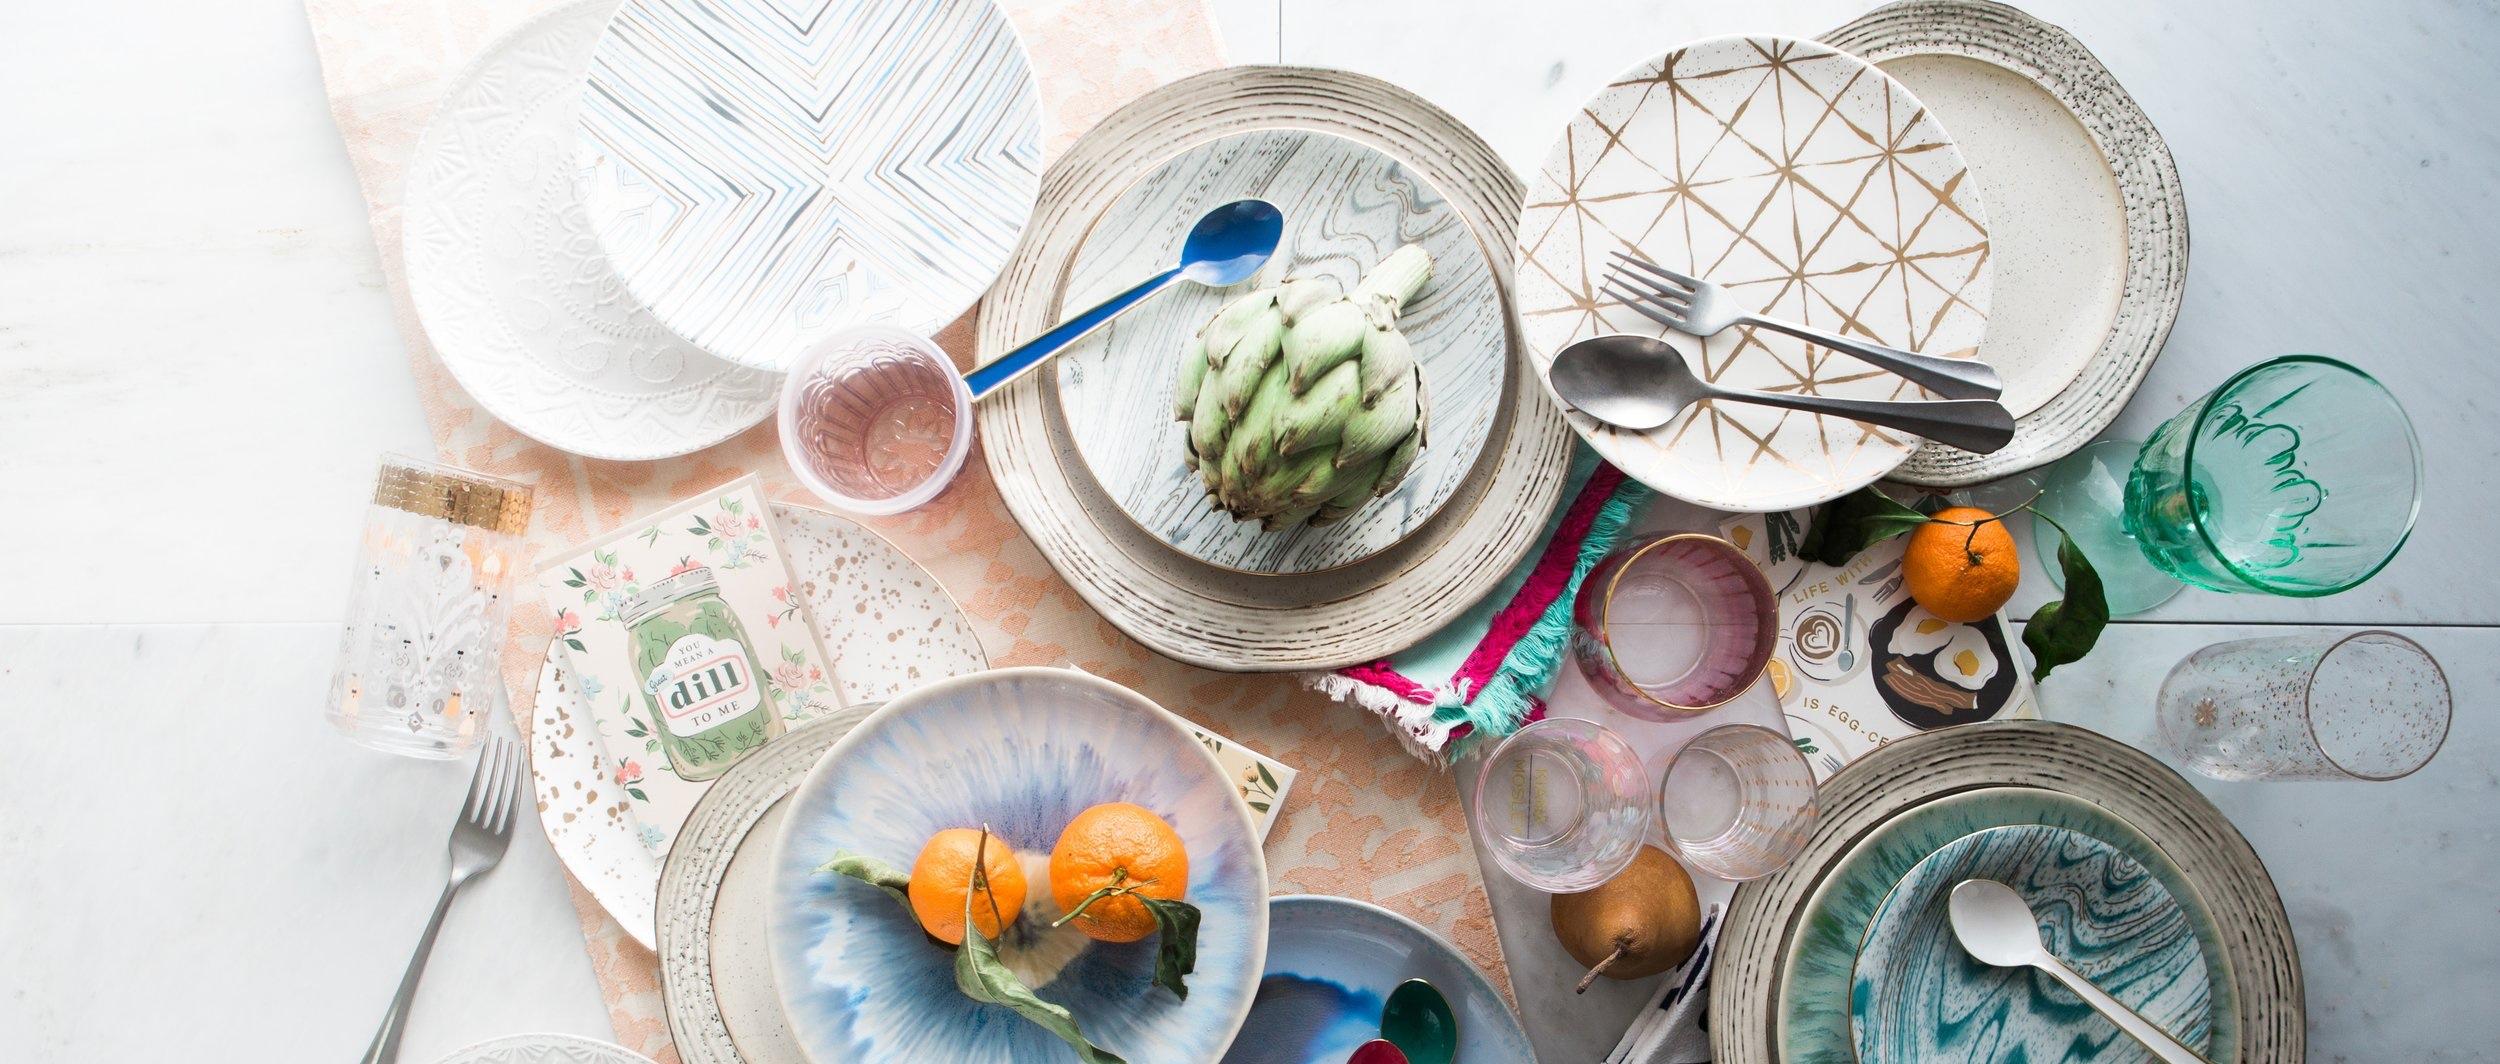 Cynthia Thurlow intermittent fasting